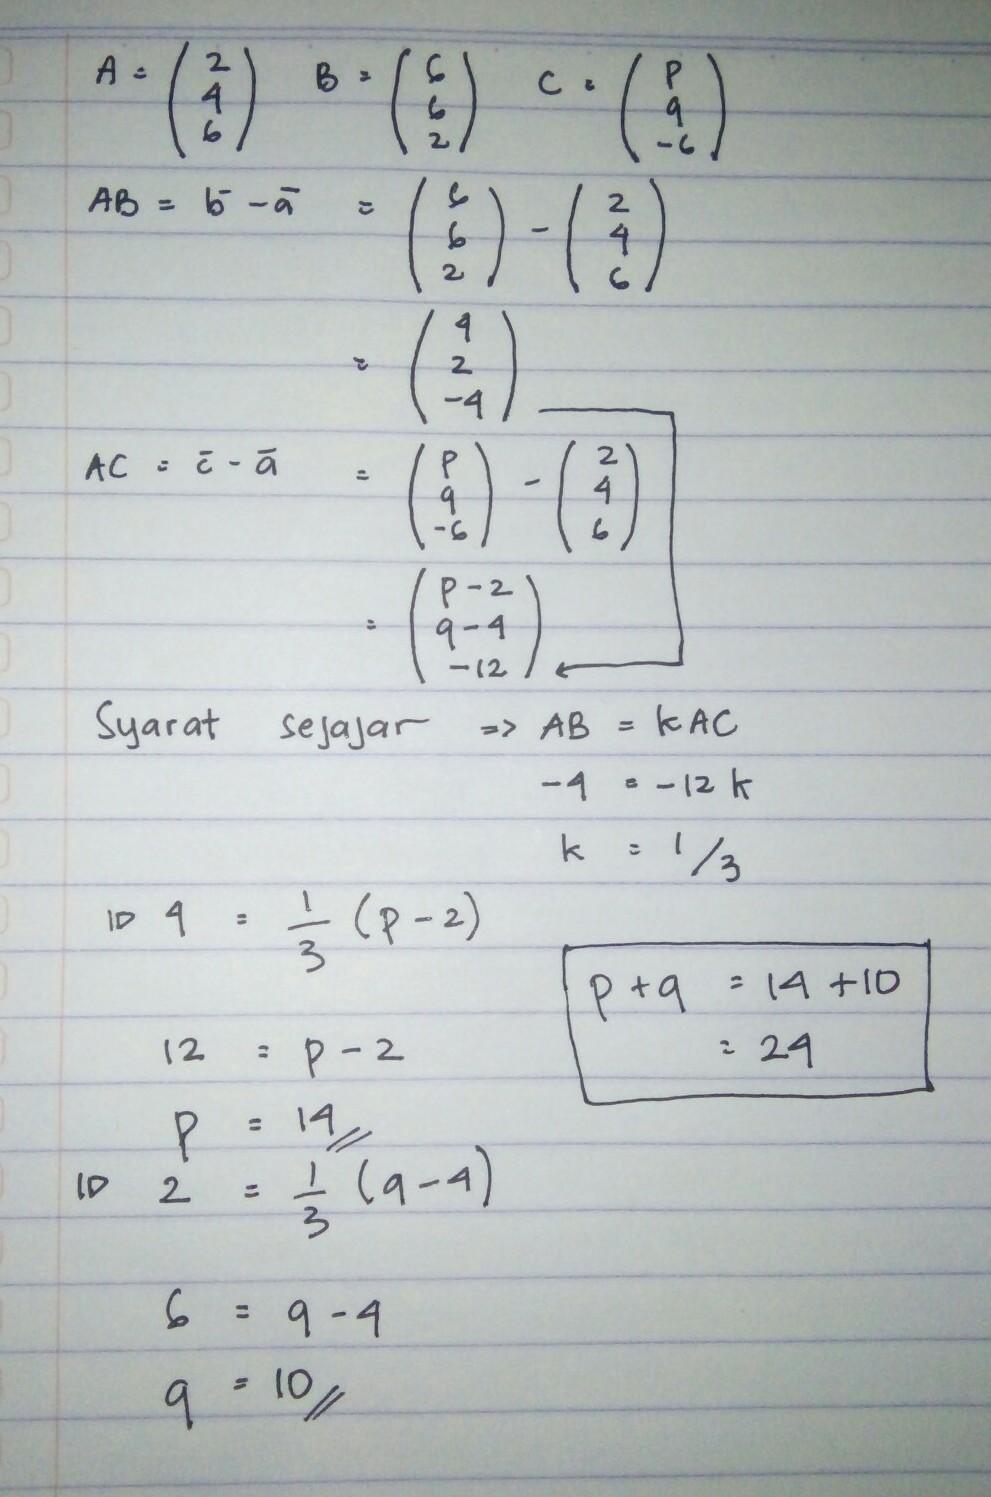 Diketahui A = : diketahui, Diketahui, (2,4,6), (6,6,2), (p,q,-6), Vektor, Sejajar, Dengan, Brainly.co.id